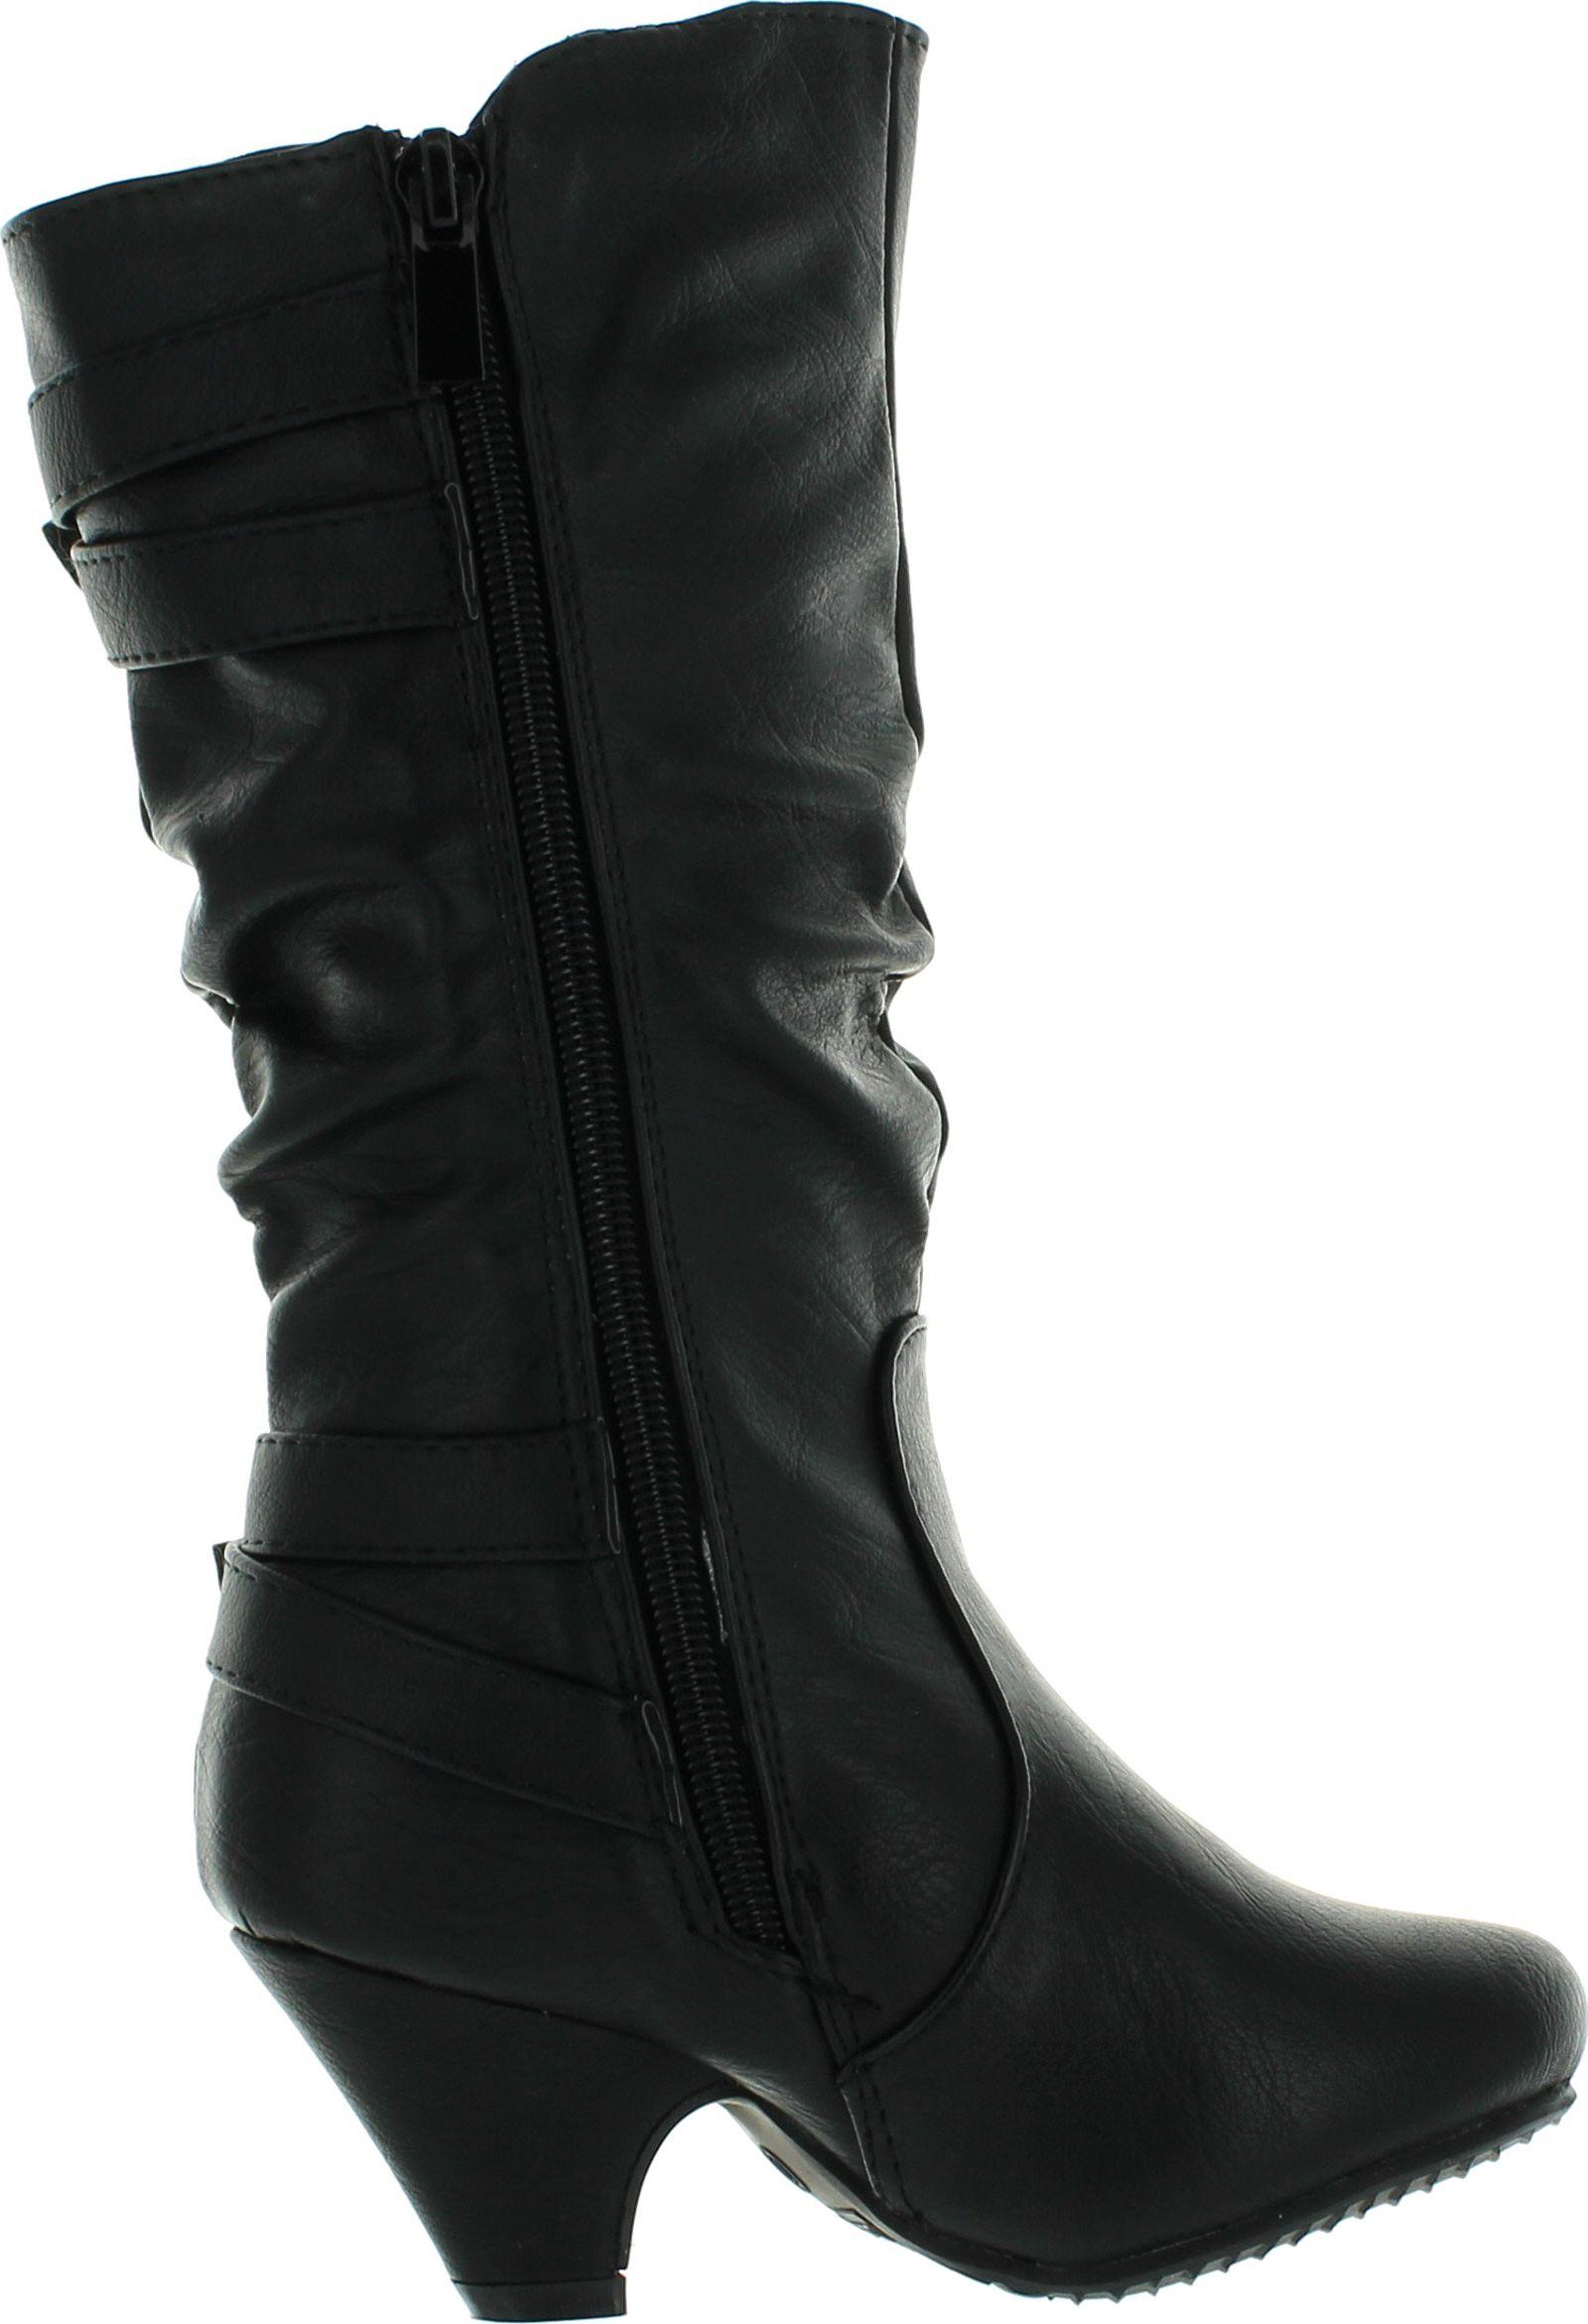 Top Moda Kids Girls Bag-55K Heel Dress Boots | eBay